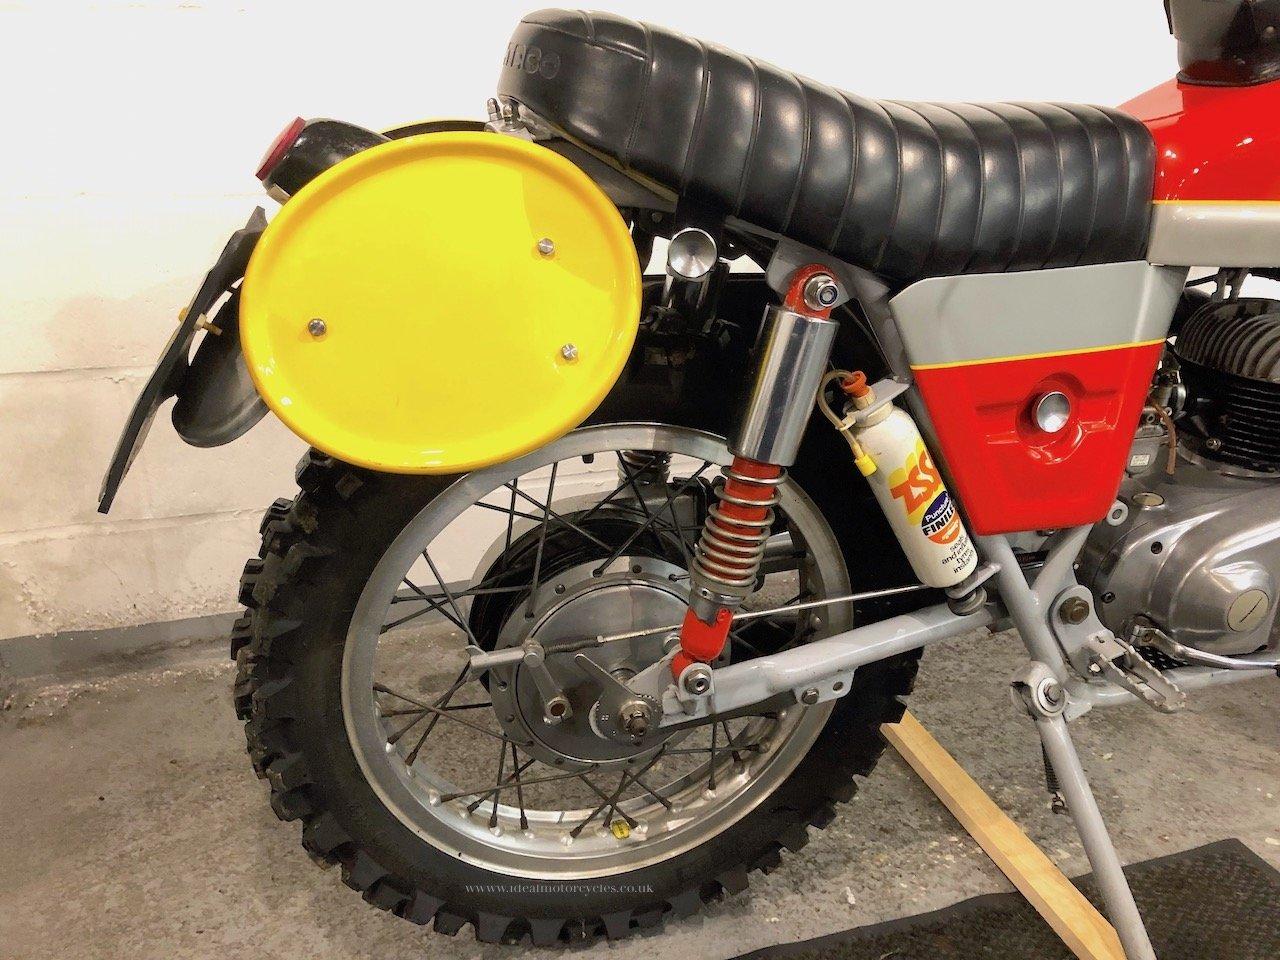 1973 Bultaco Matador Mk4 250cc Enduro Motorcycle For Sale (picture 2 of 6)